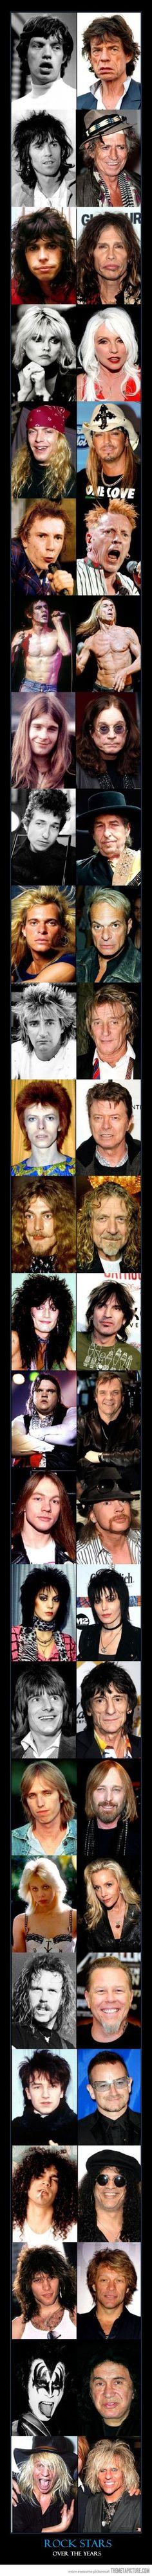 Music idols getting older. Interesting